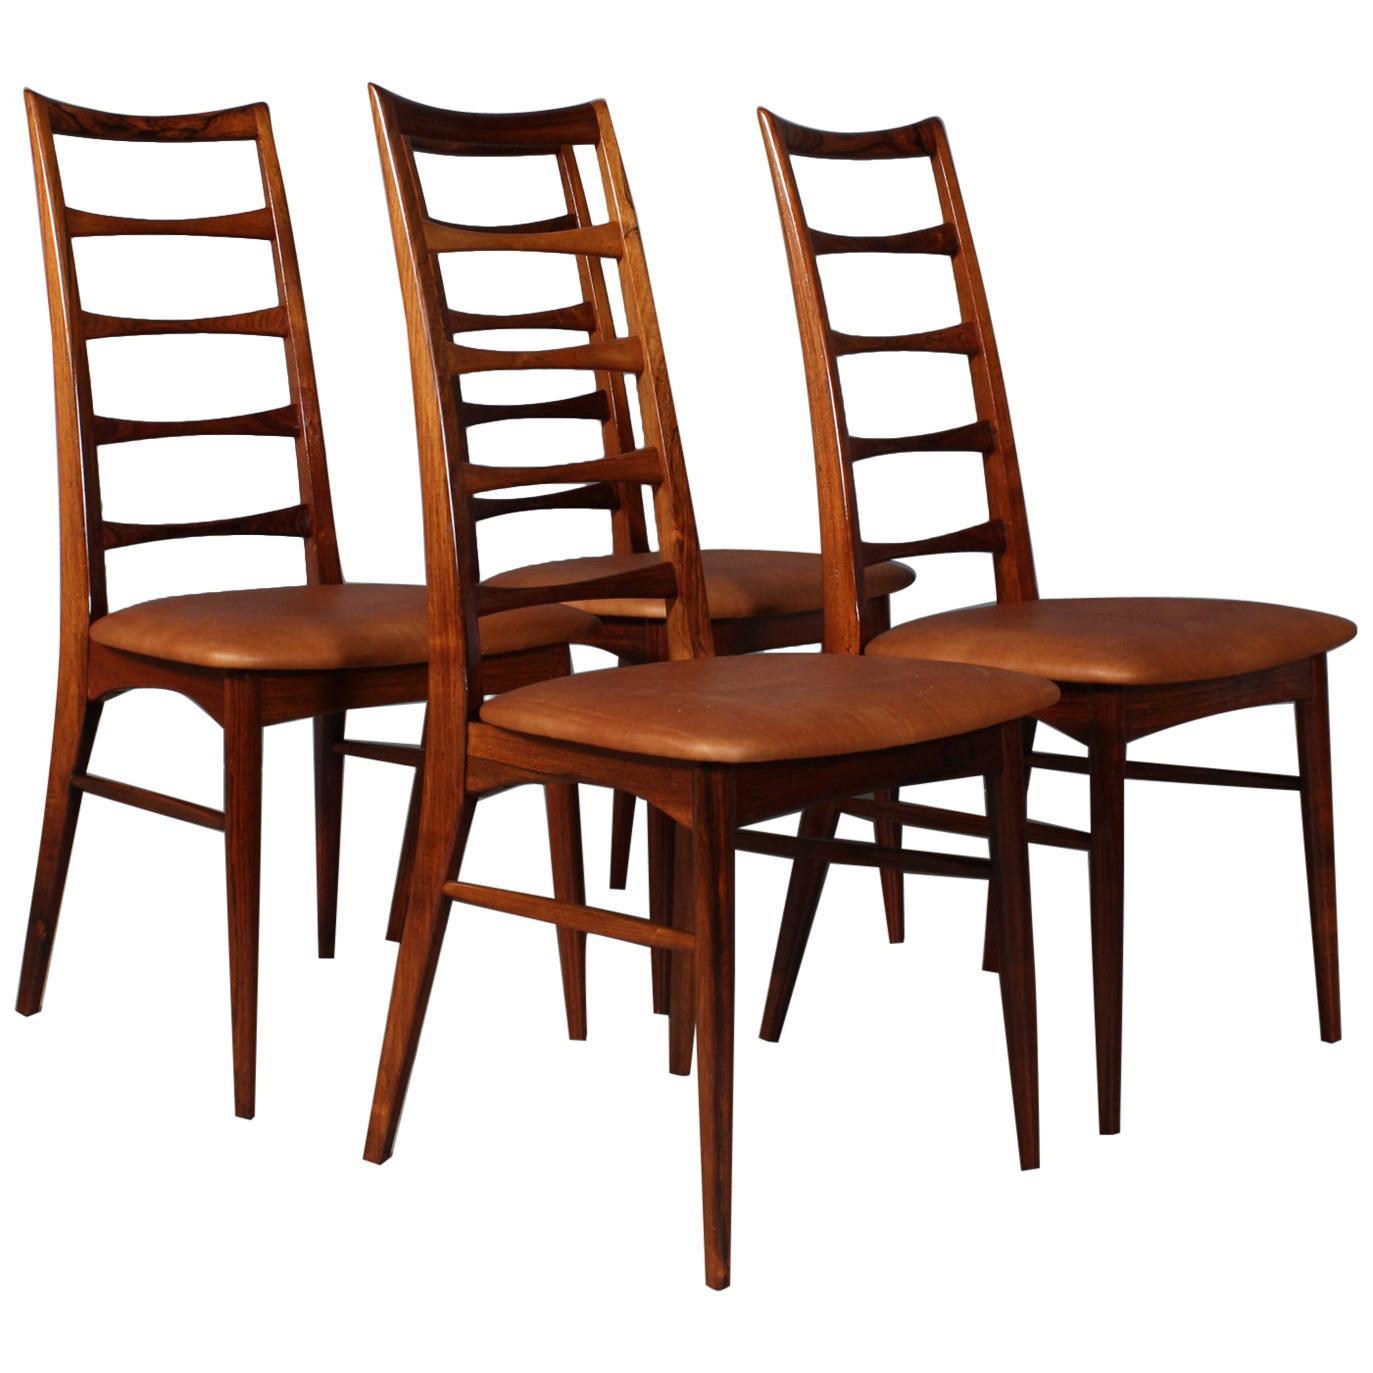 "Set of Niels Koefoed Dining Chairs, Model ""Lis"", Rosewood, 1960s"